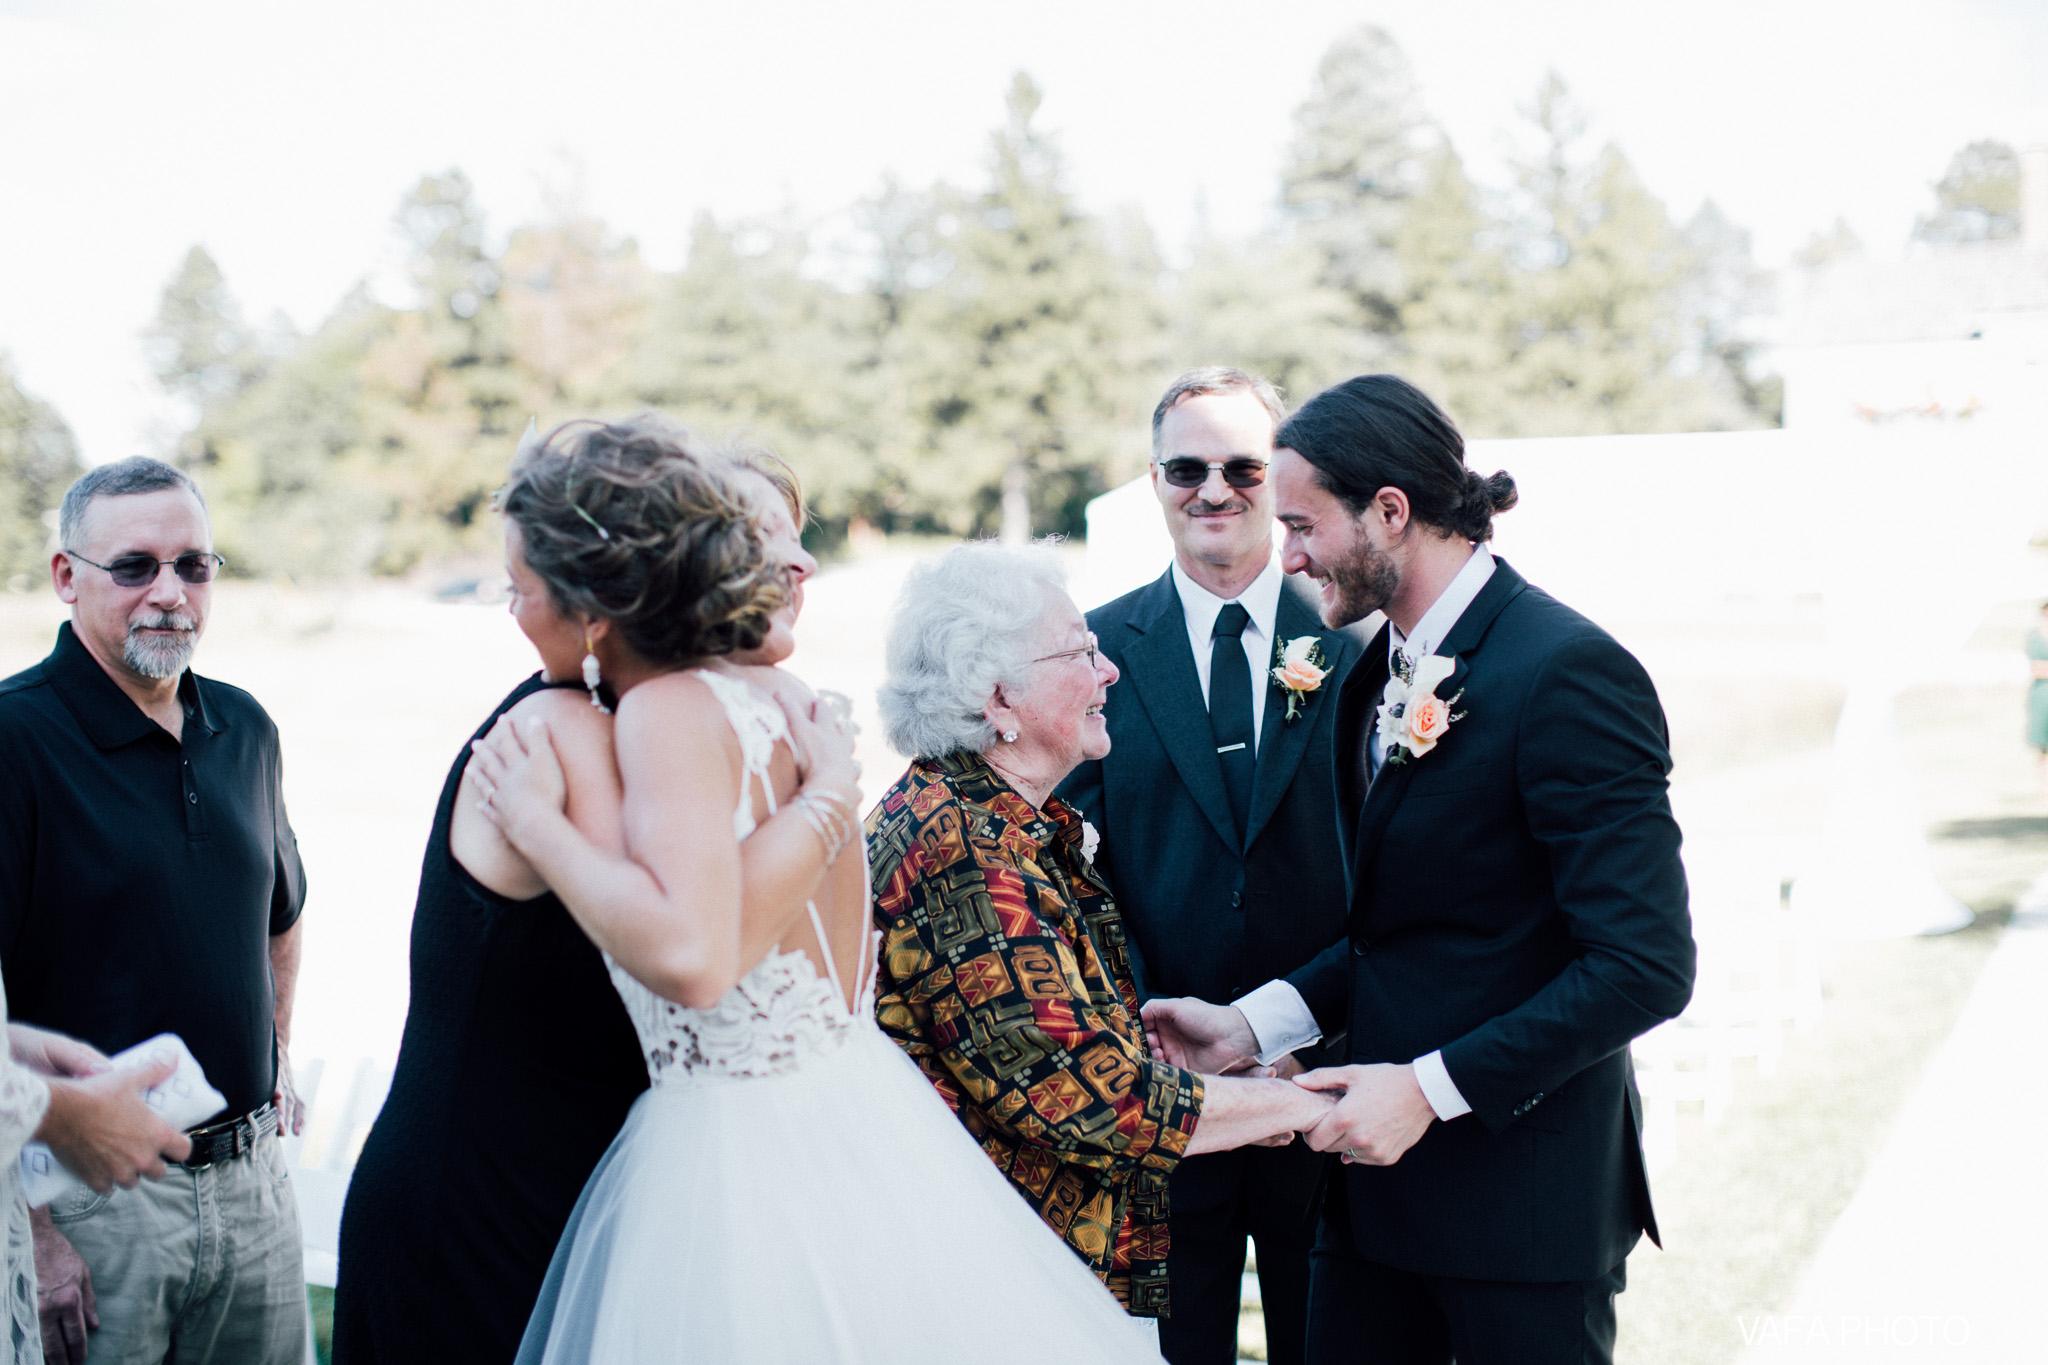 The-Felt-Estate-Wedding-Kailie-David-Vafa-Photo-432.jpg